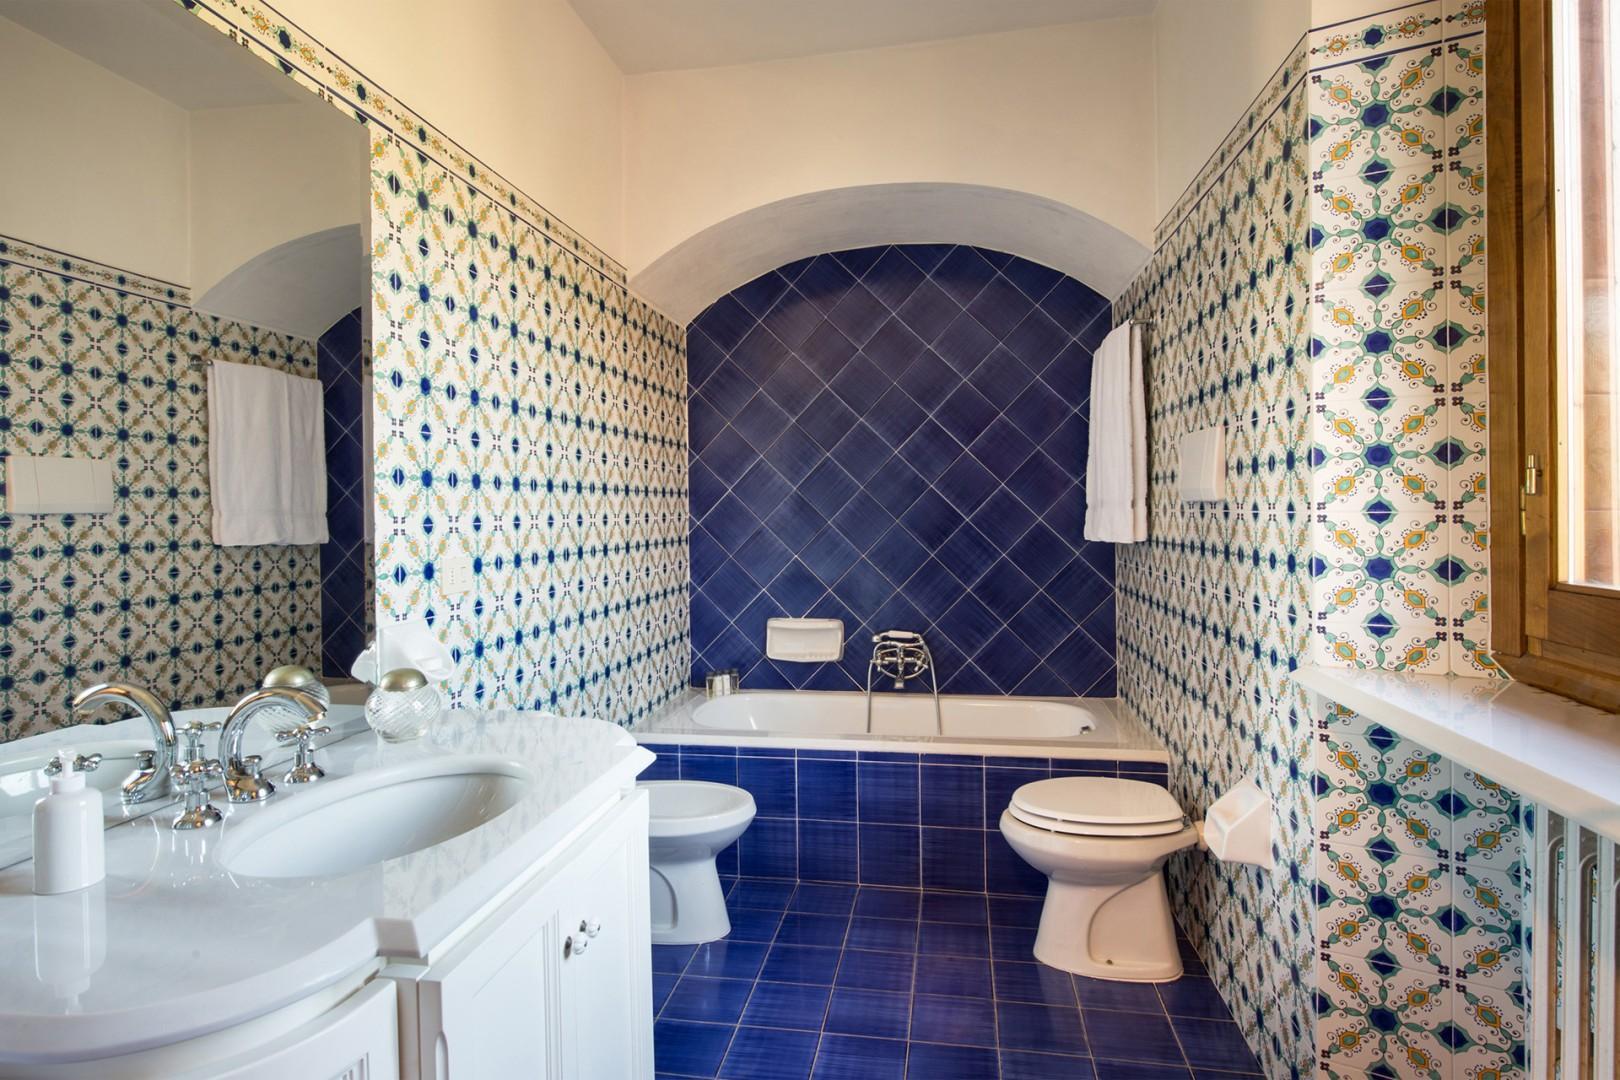 Beautiful bathroom 2 with bathtub, sink, toilet and bidet